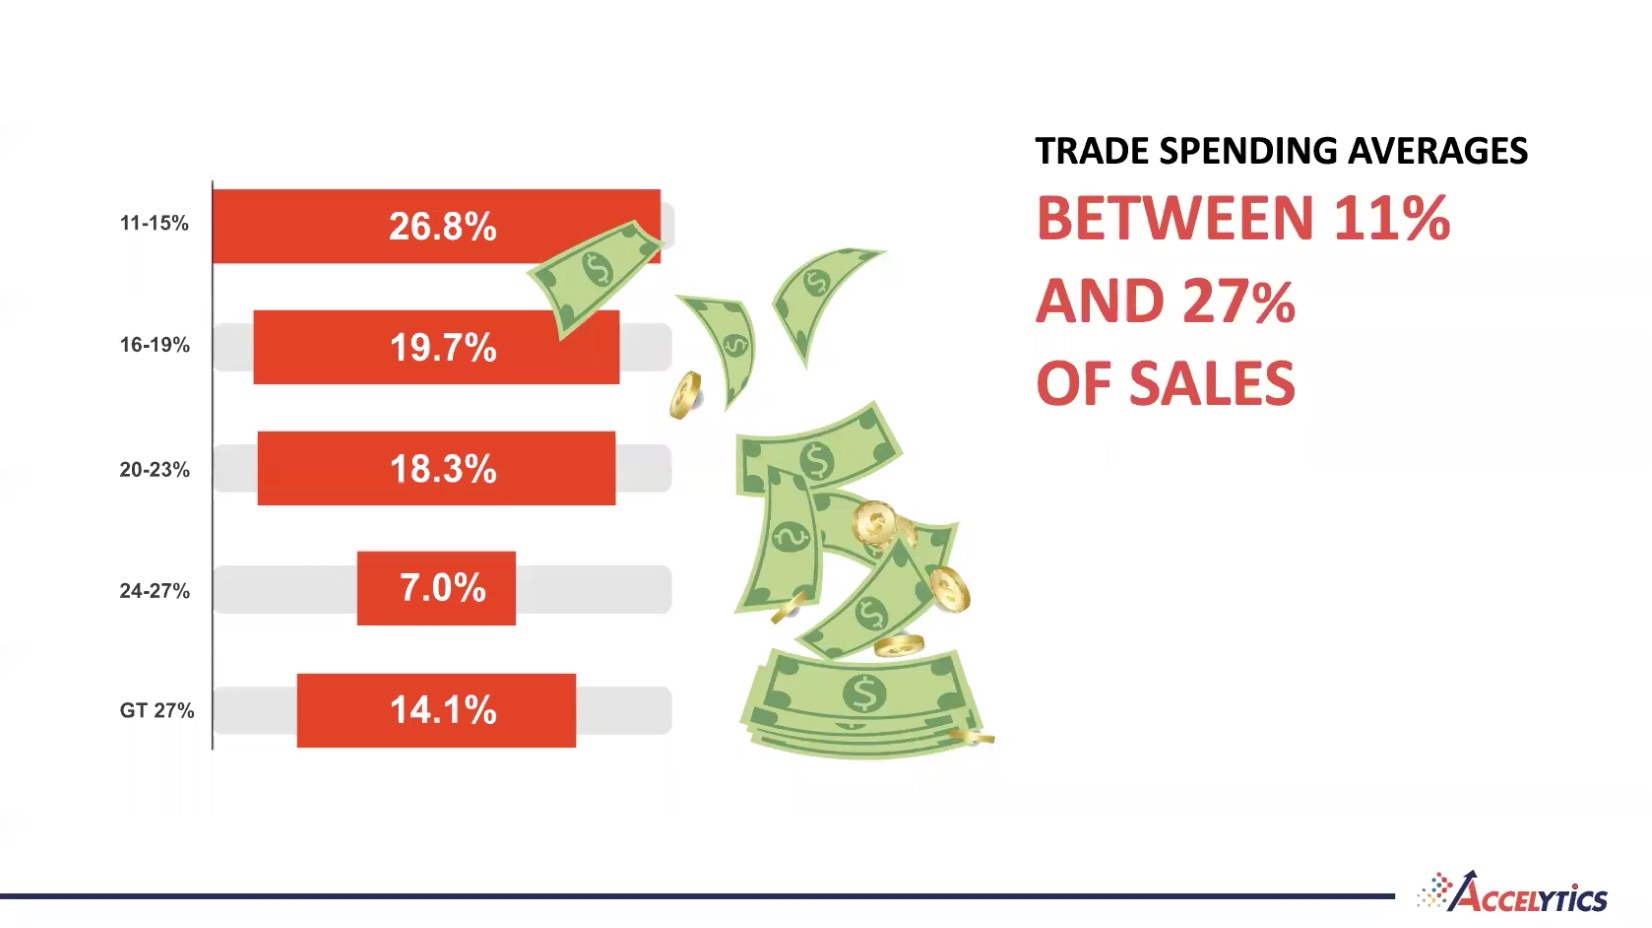 trade promotion management spending